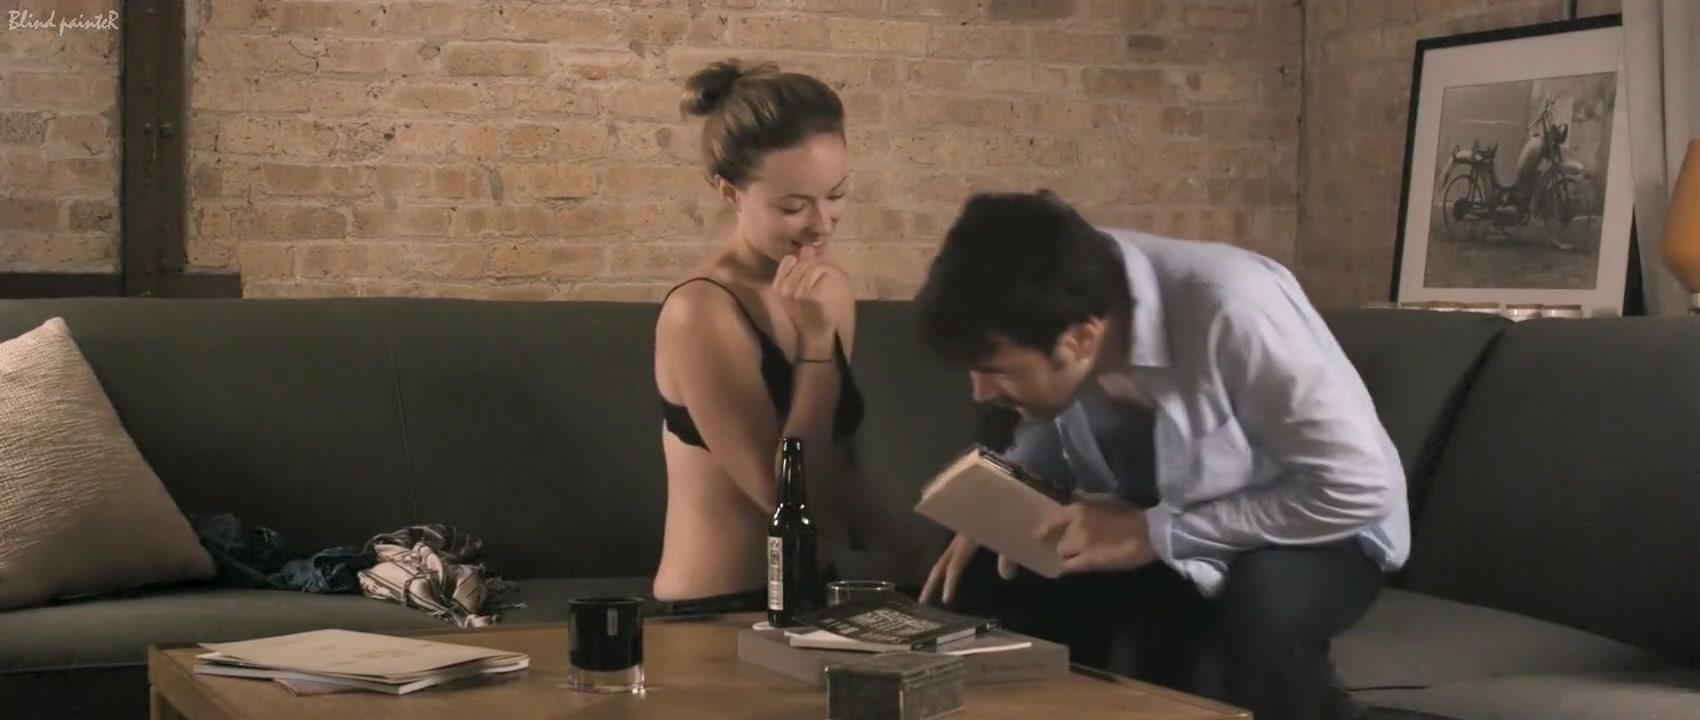 Nude gallery Mom russian porno video